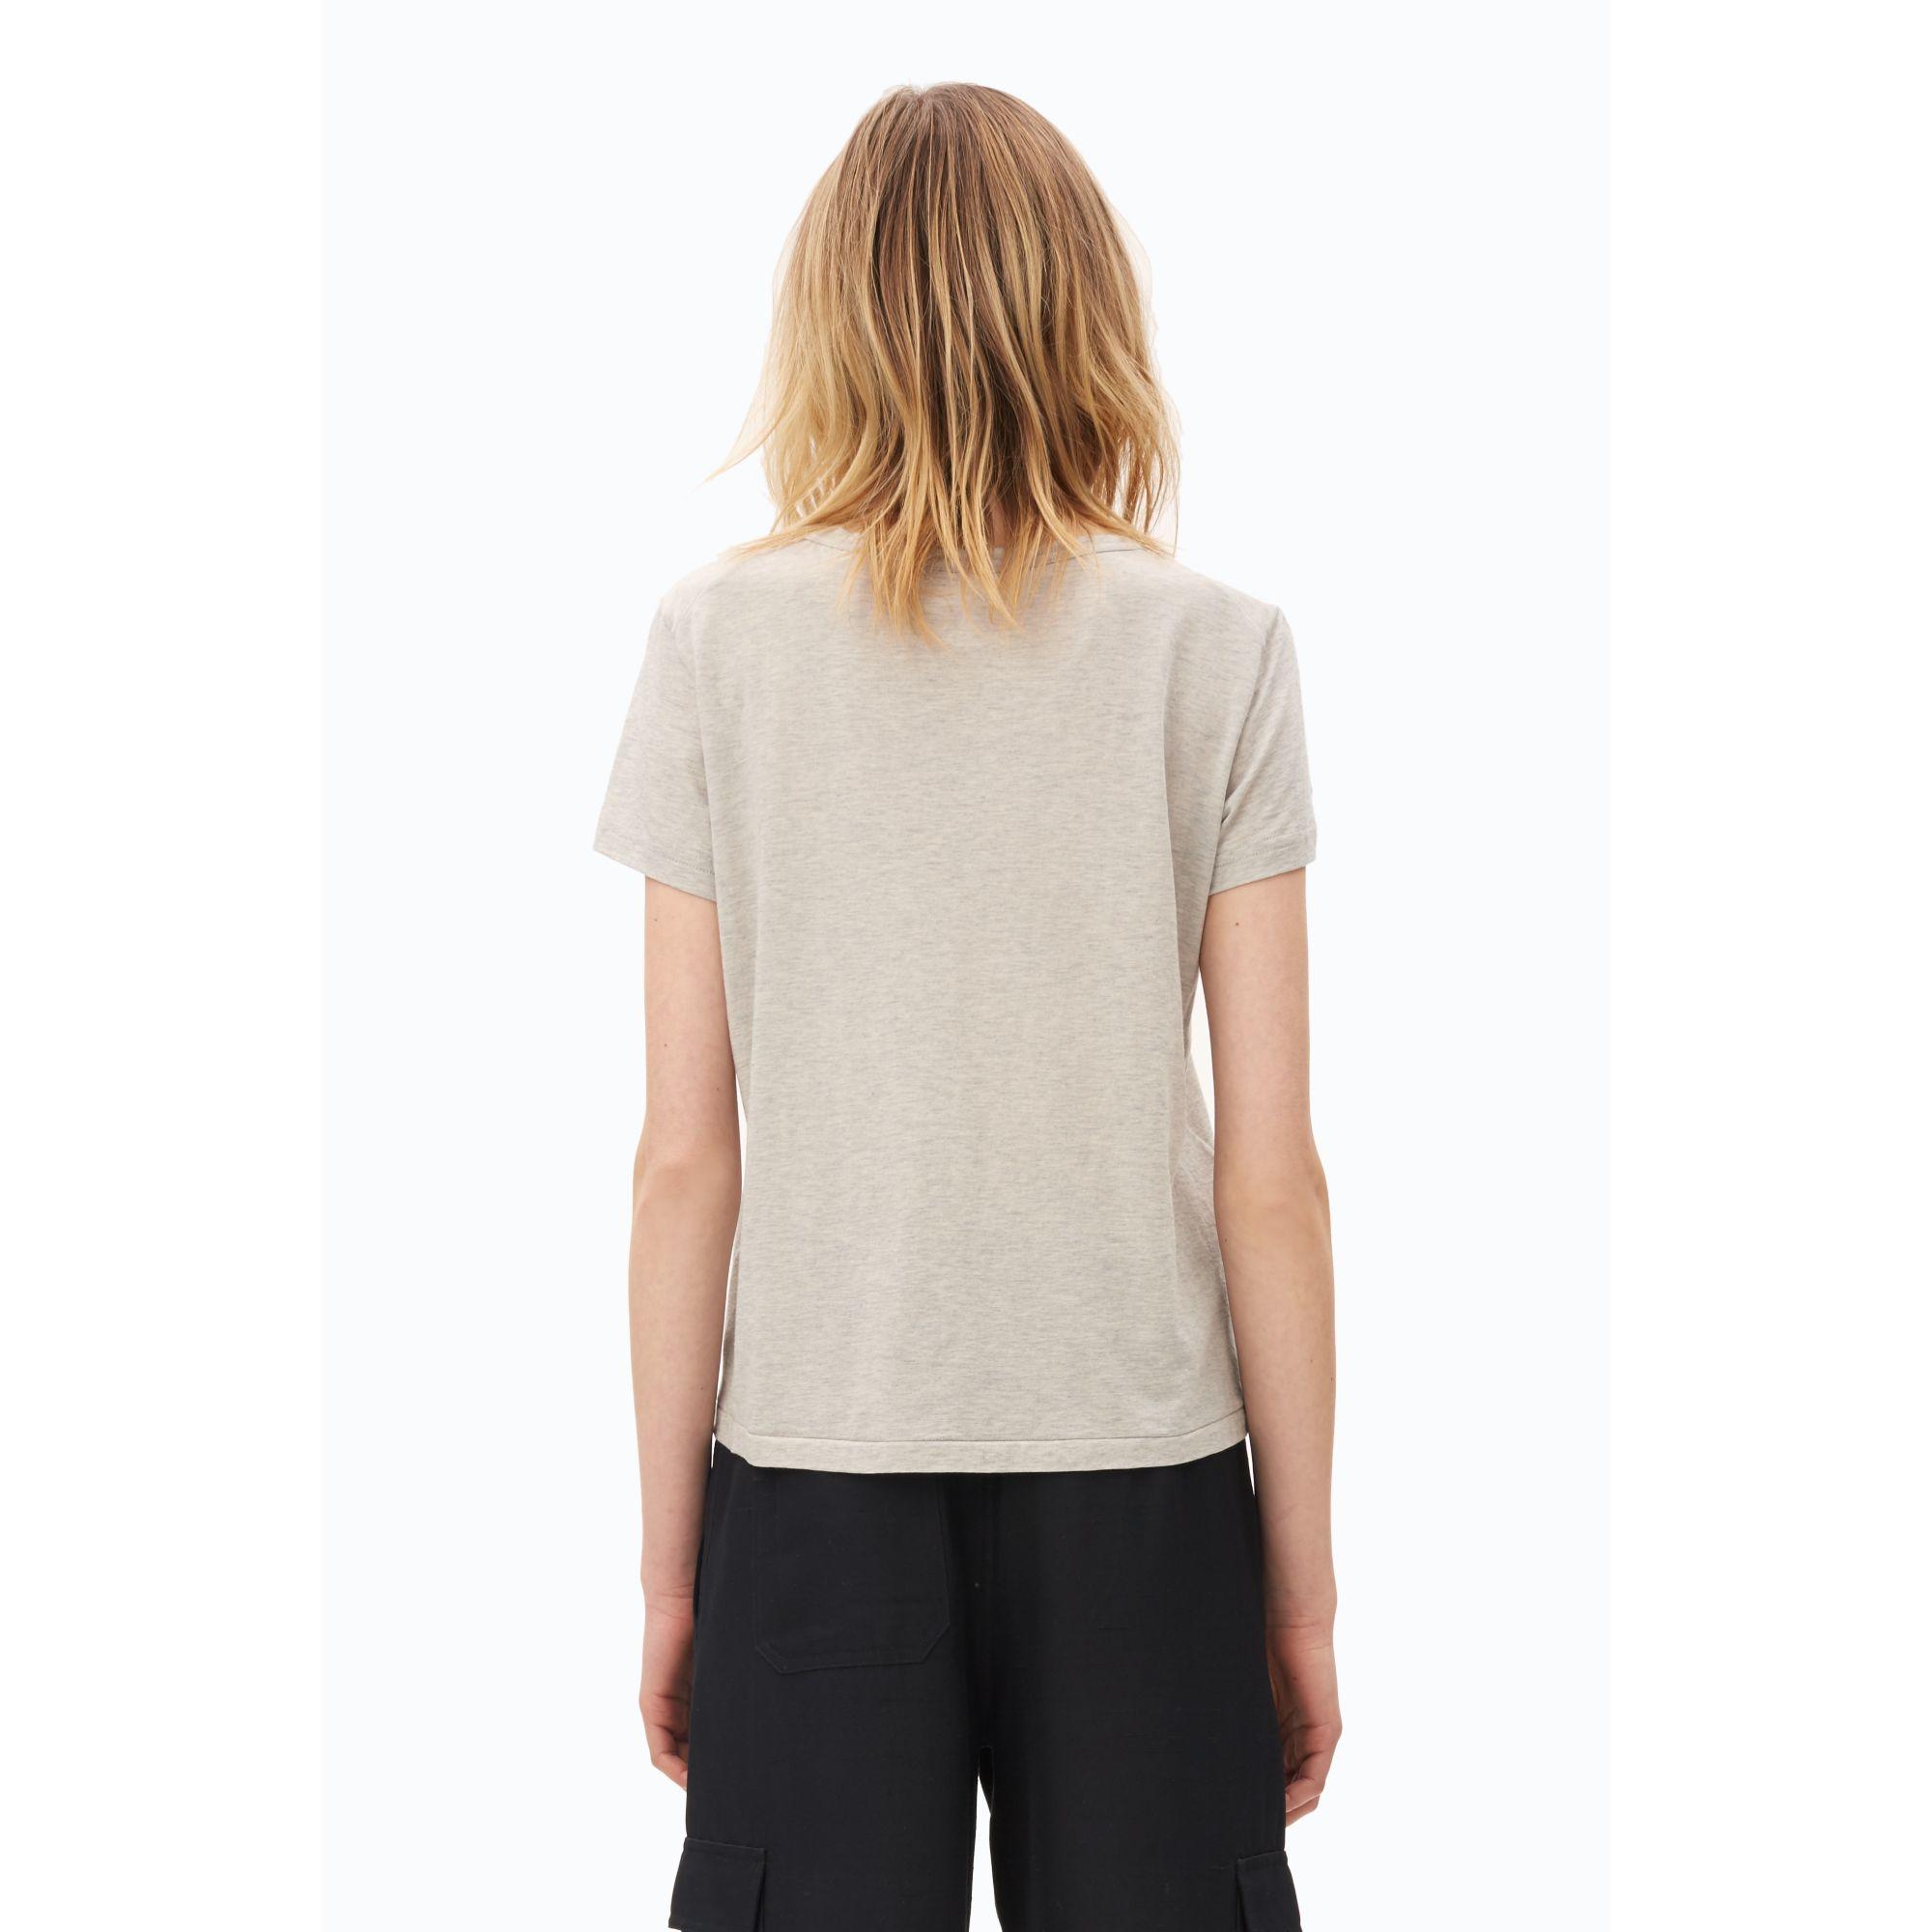 helmut lang cotton cashmere kick front t shirt in gray lyst. Black Bedroom Furniture Sets. Home Design Ideas